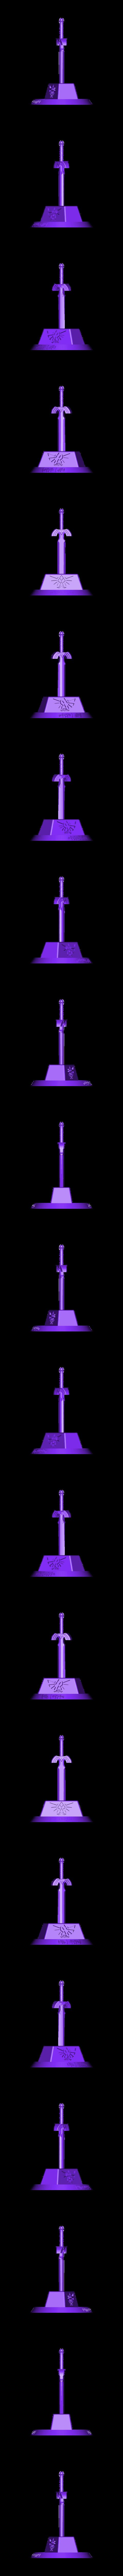 Espada Maestra.stl Download free STL file Master Sword (Zelda) • 3D printable design, Zambrana95